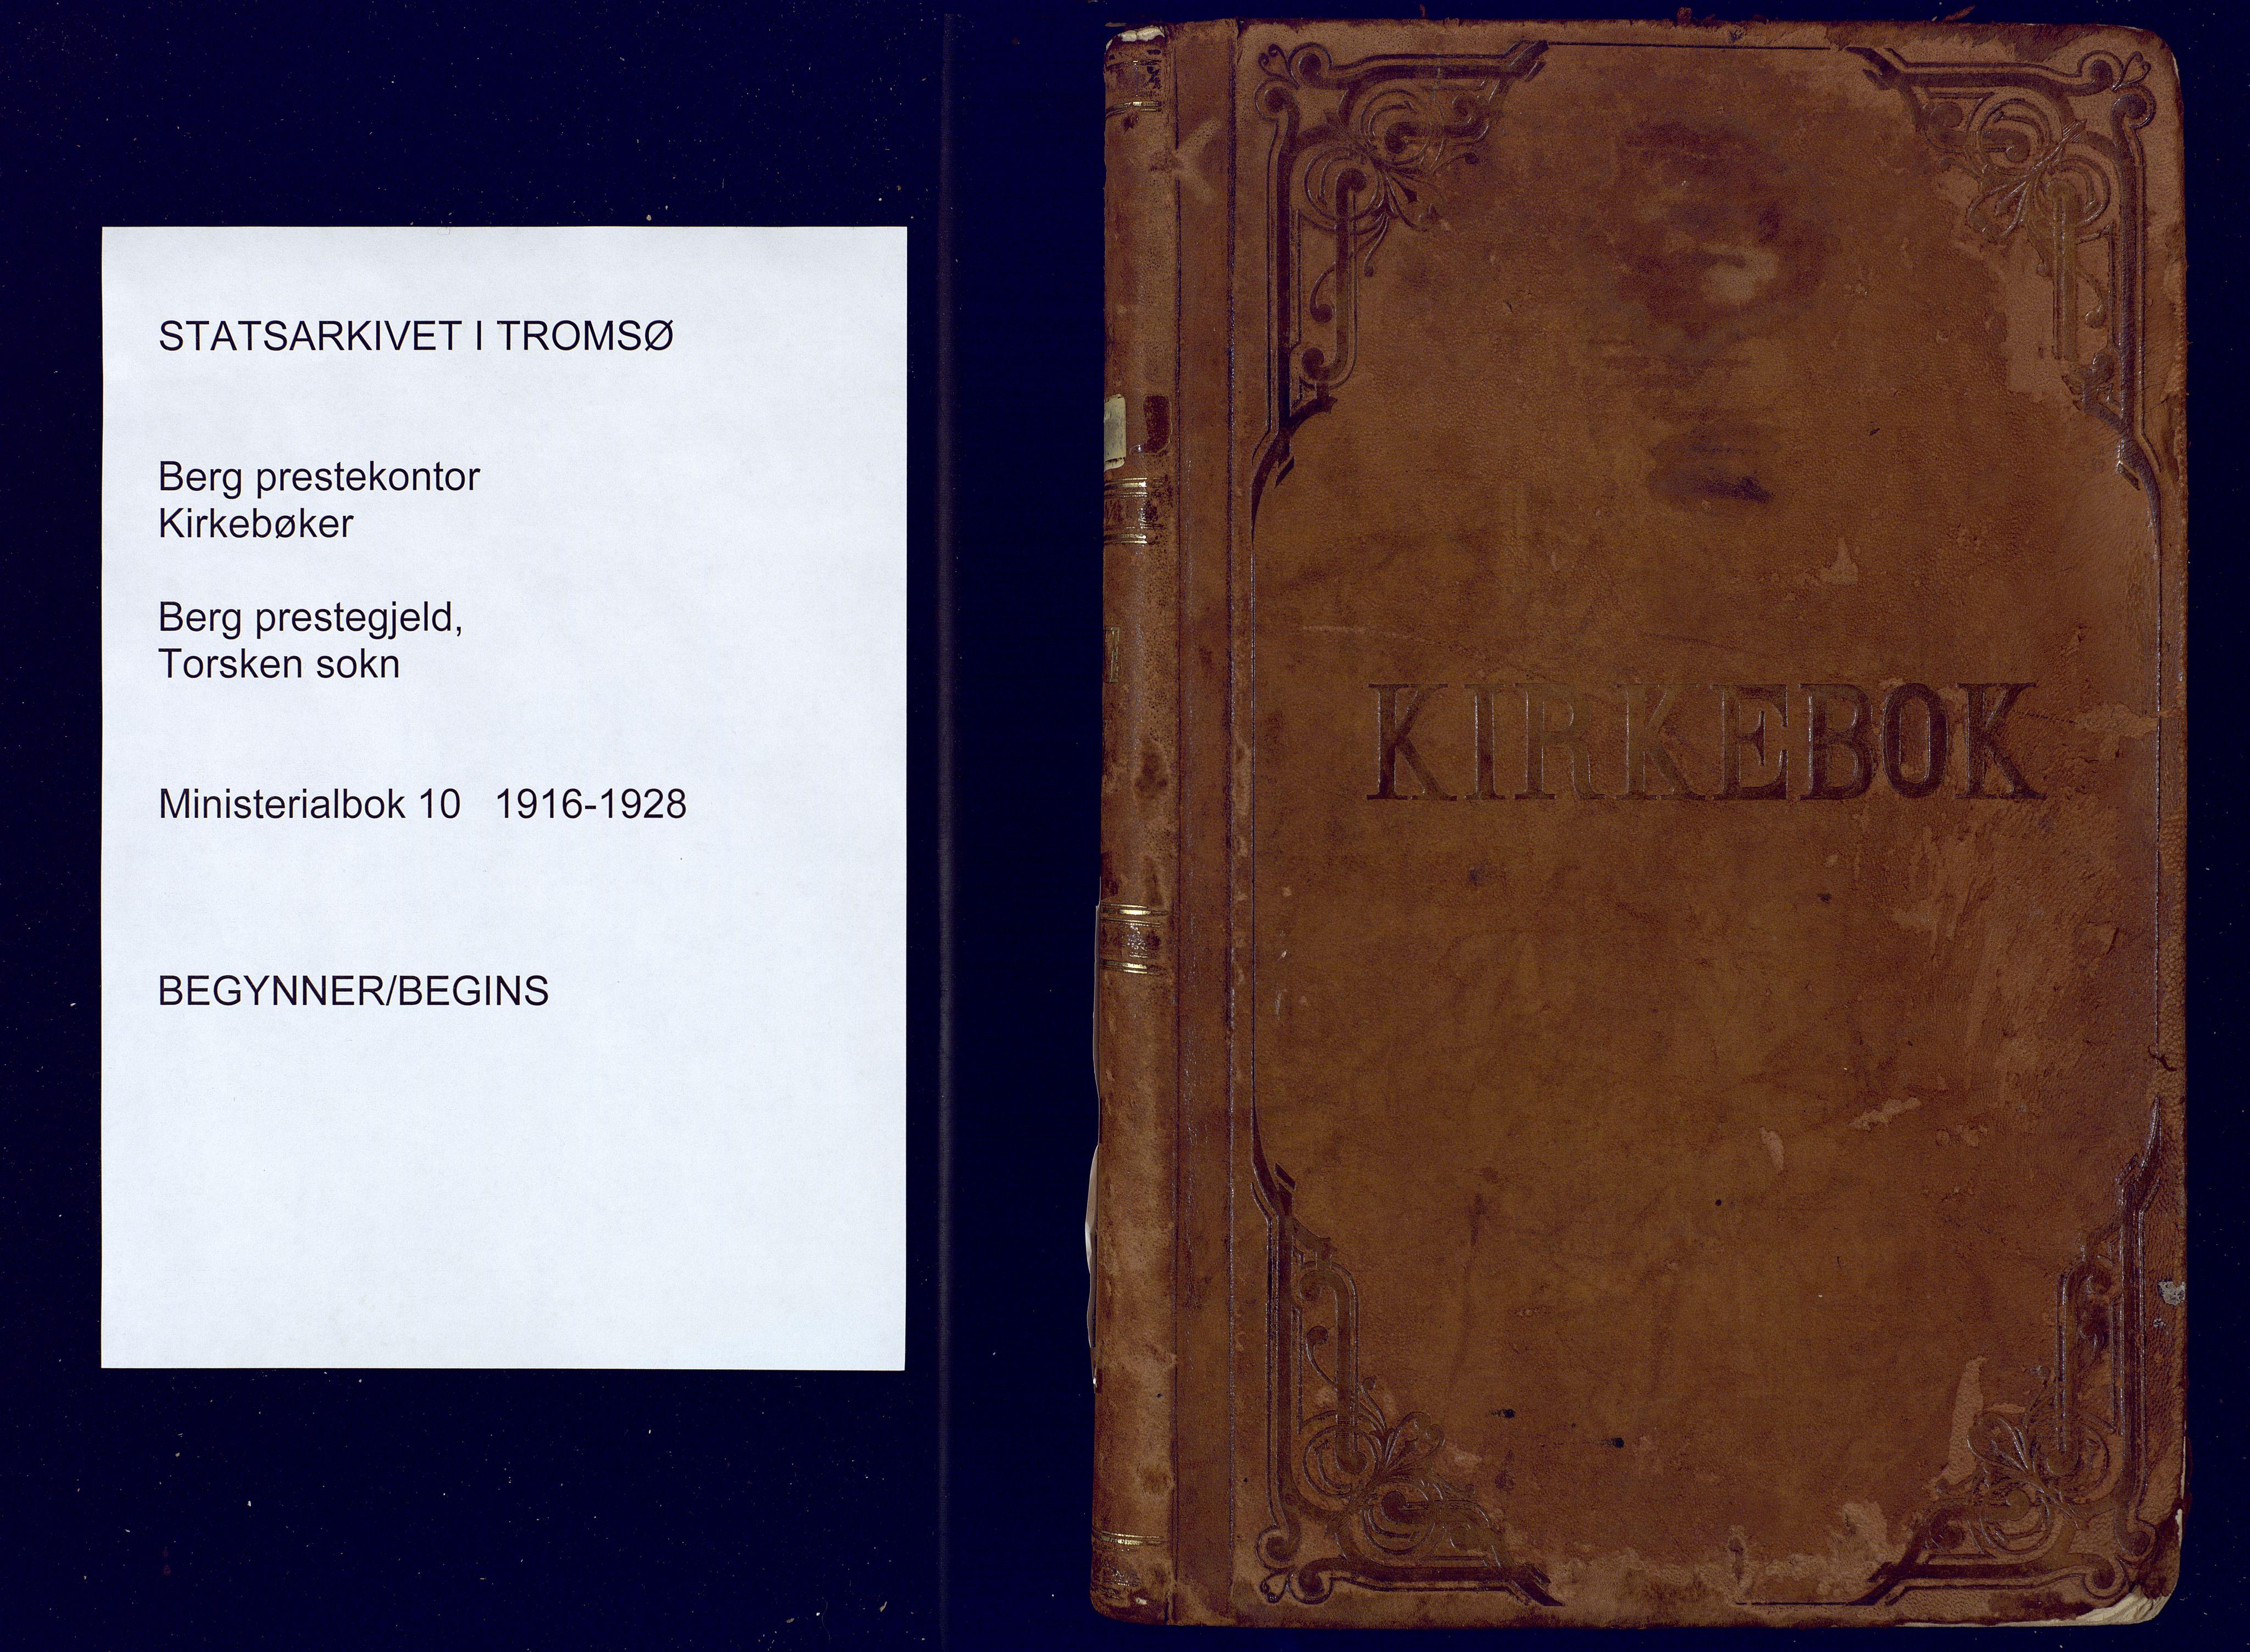 SATØ, Mefjord/Berg sokneprestkontor, G/Ga/Gaa: Ministerialbok nr. 10, 1916-1928